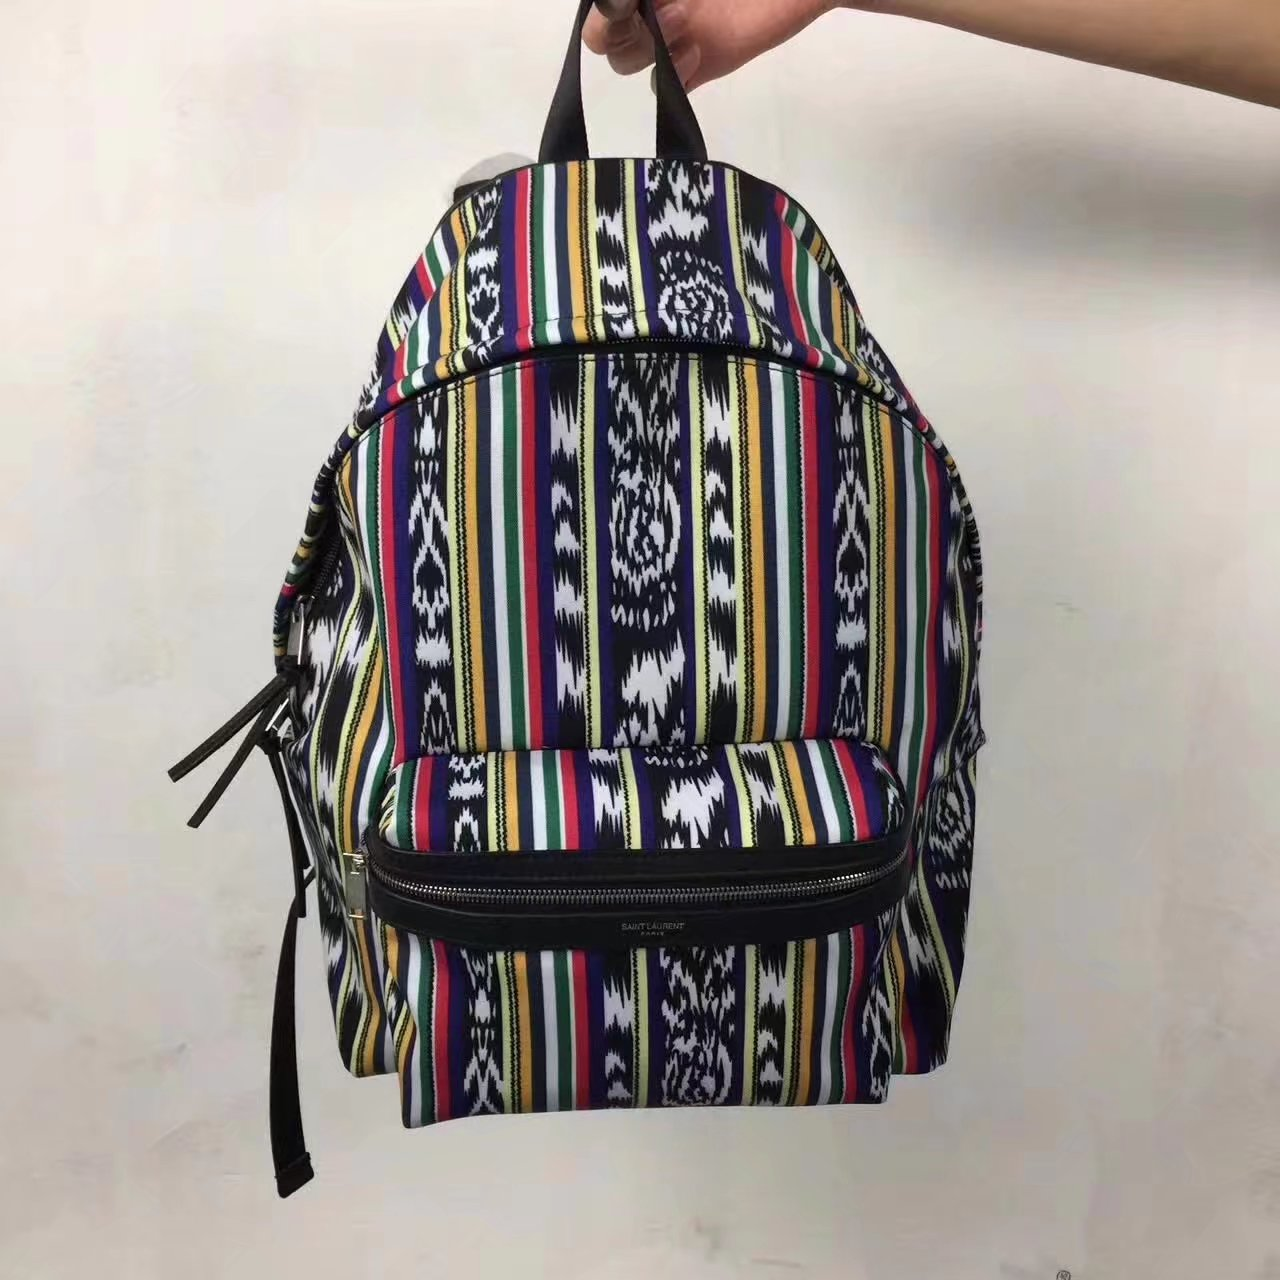 Saint Laurent Women City Backpack In Multicolored Ikat Canvas